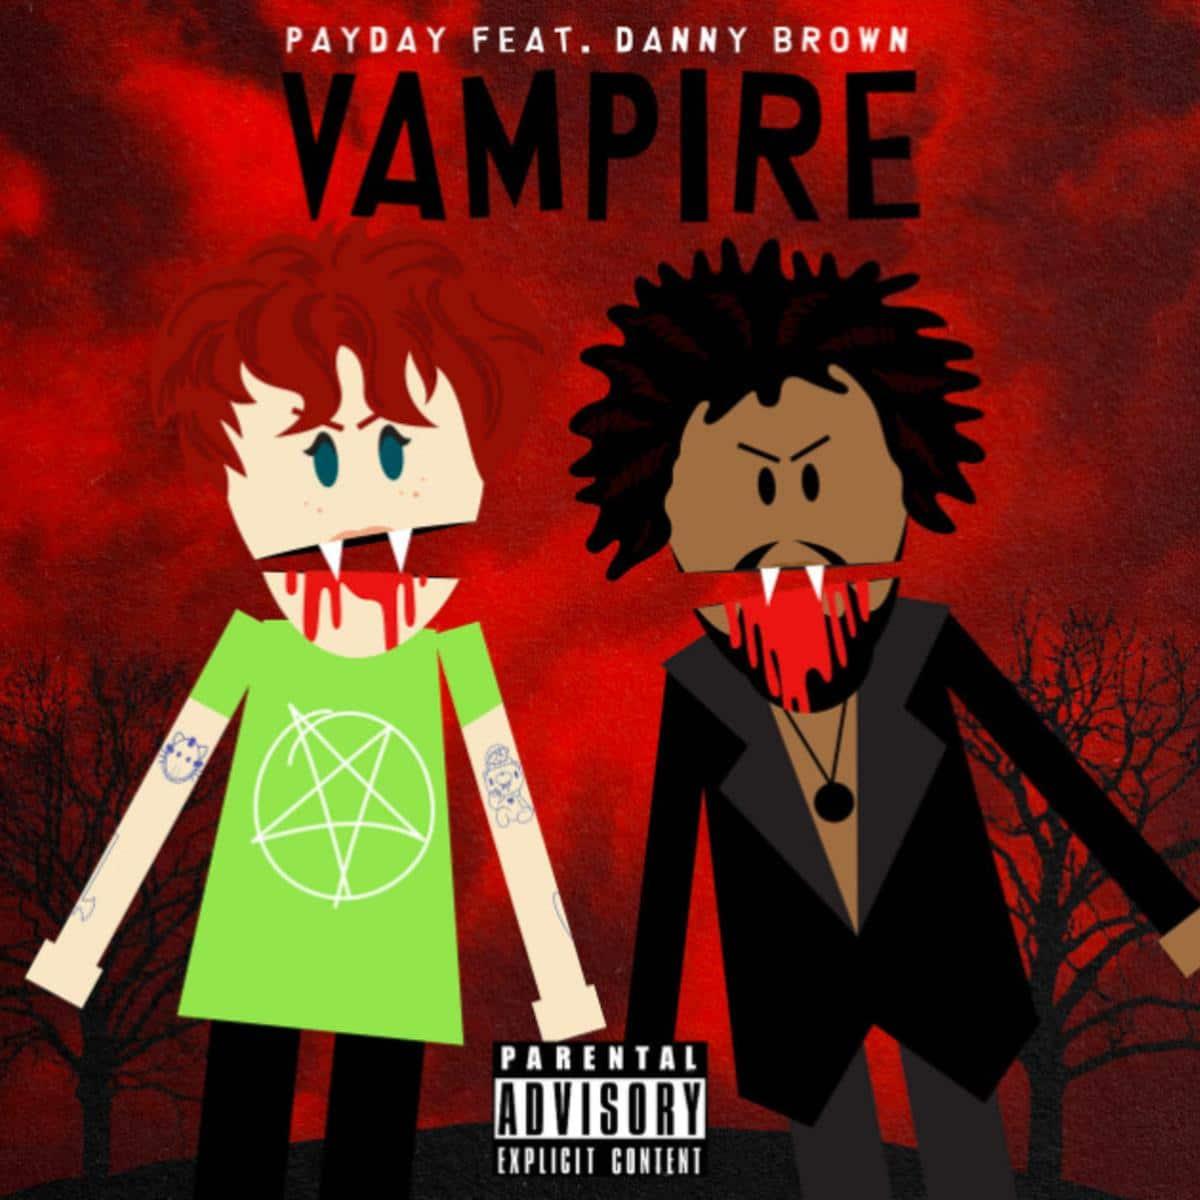 Payday Ft. Danny Brown - Vampire